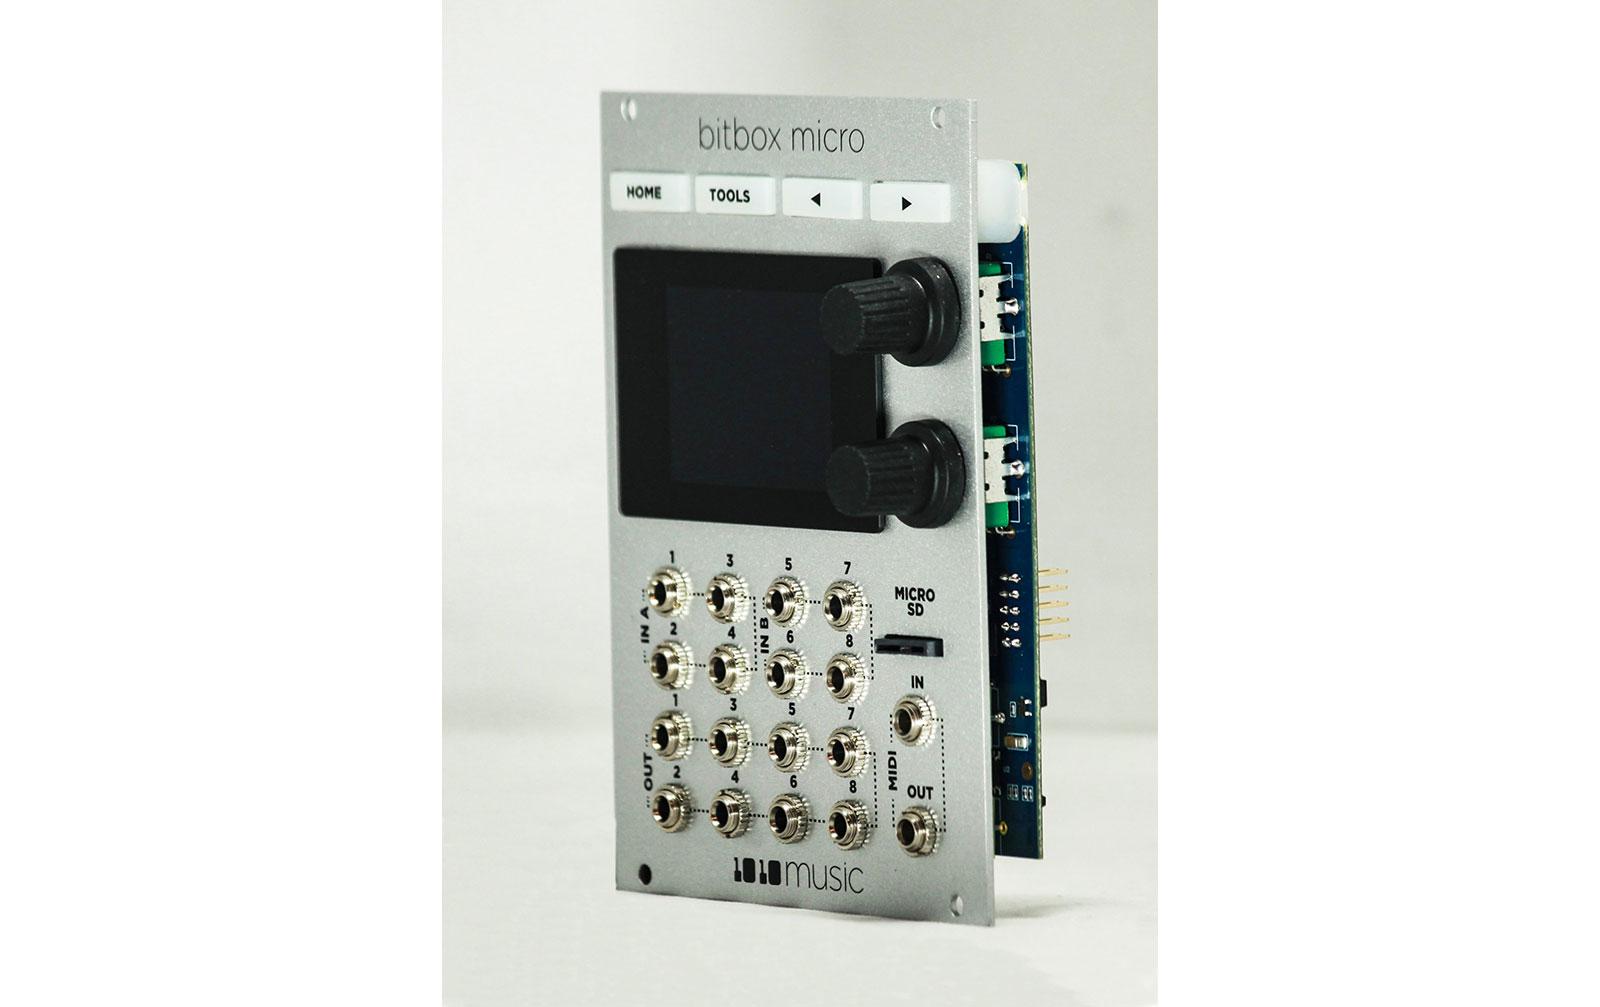 1010music bitbox micro